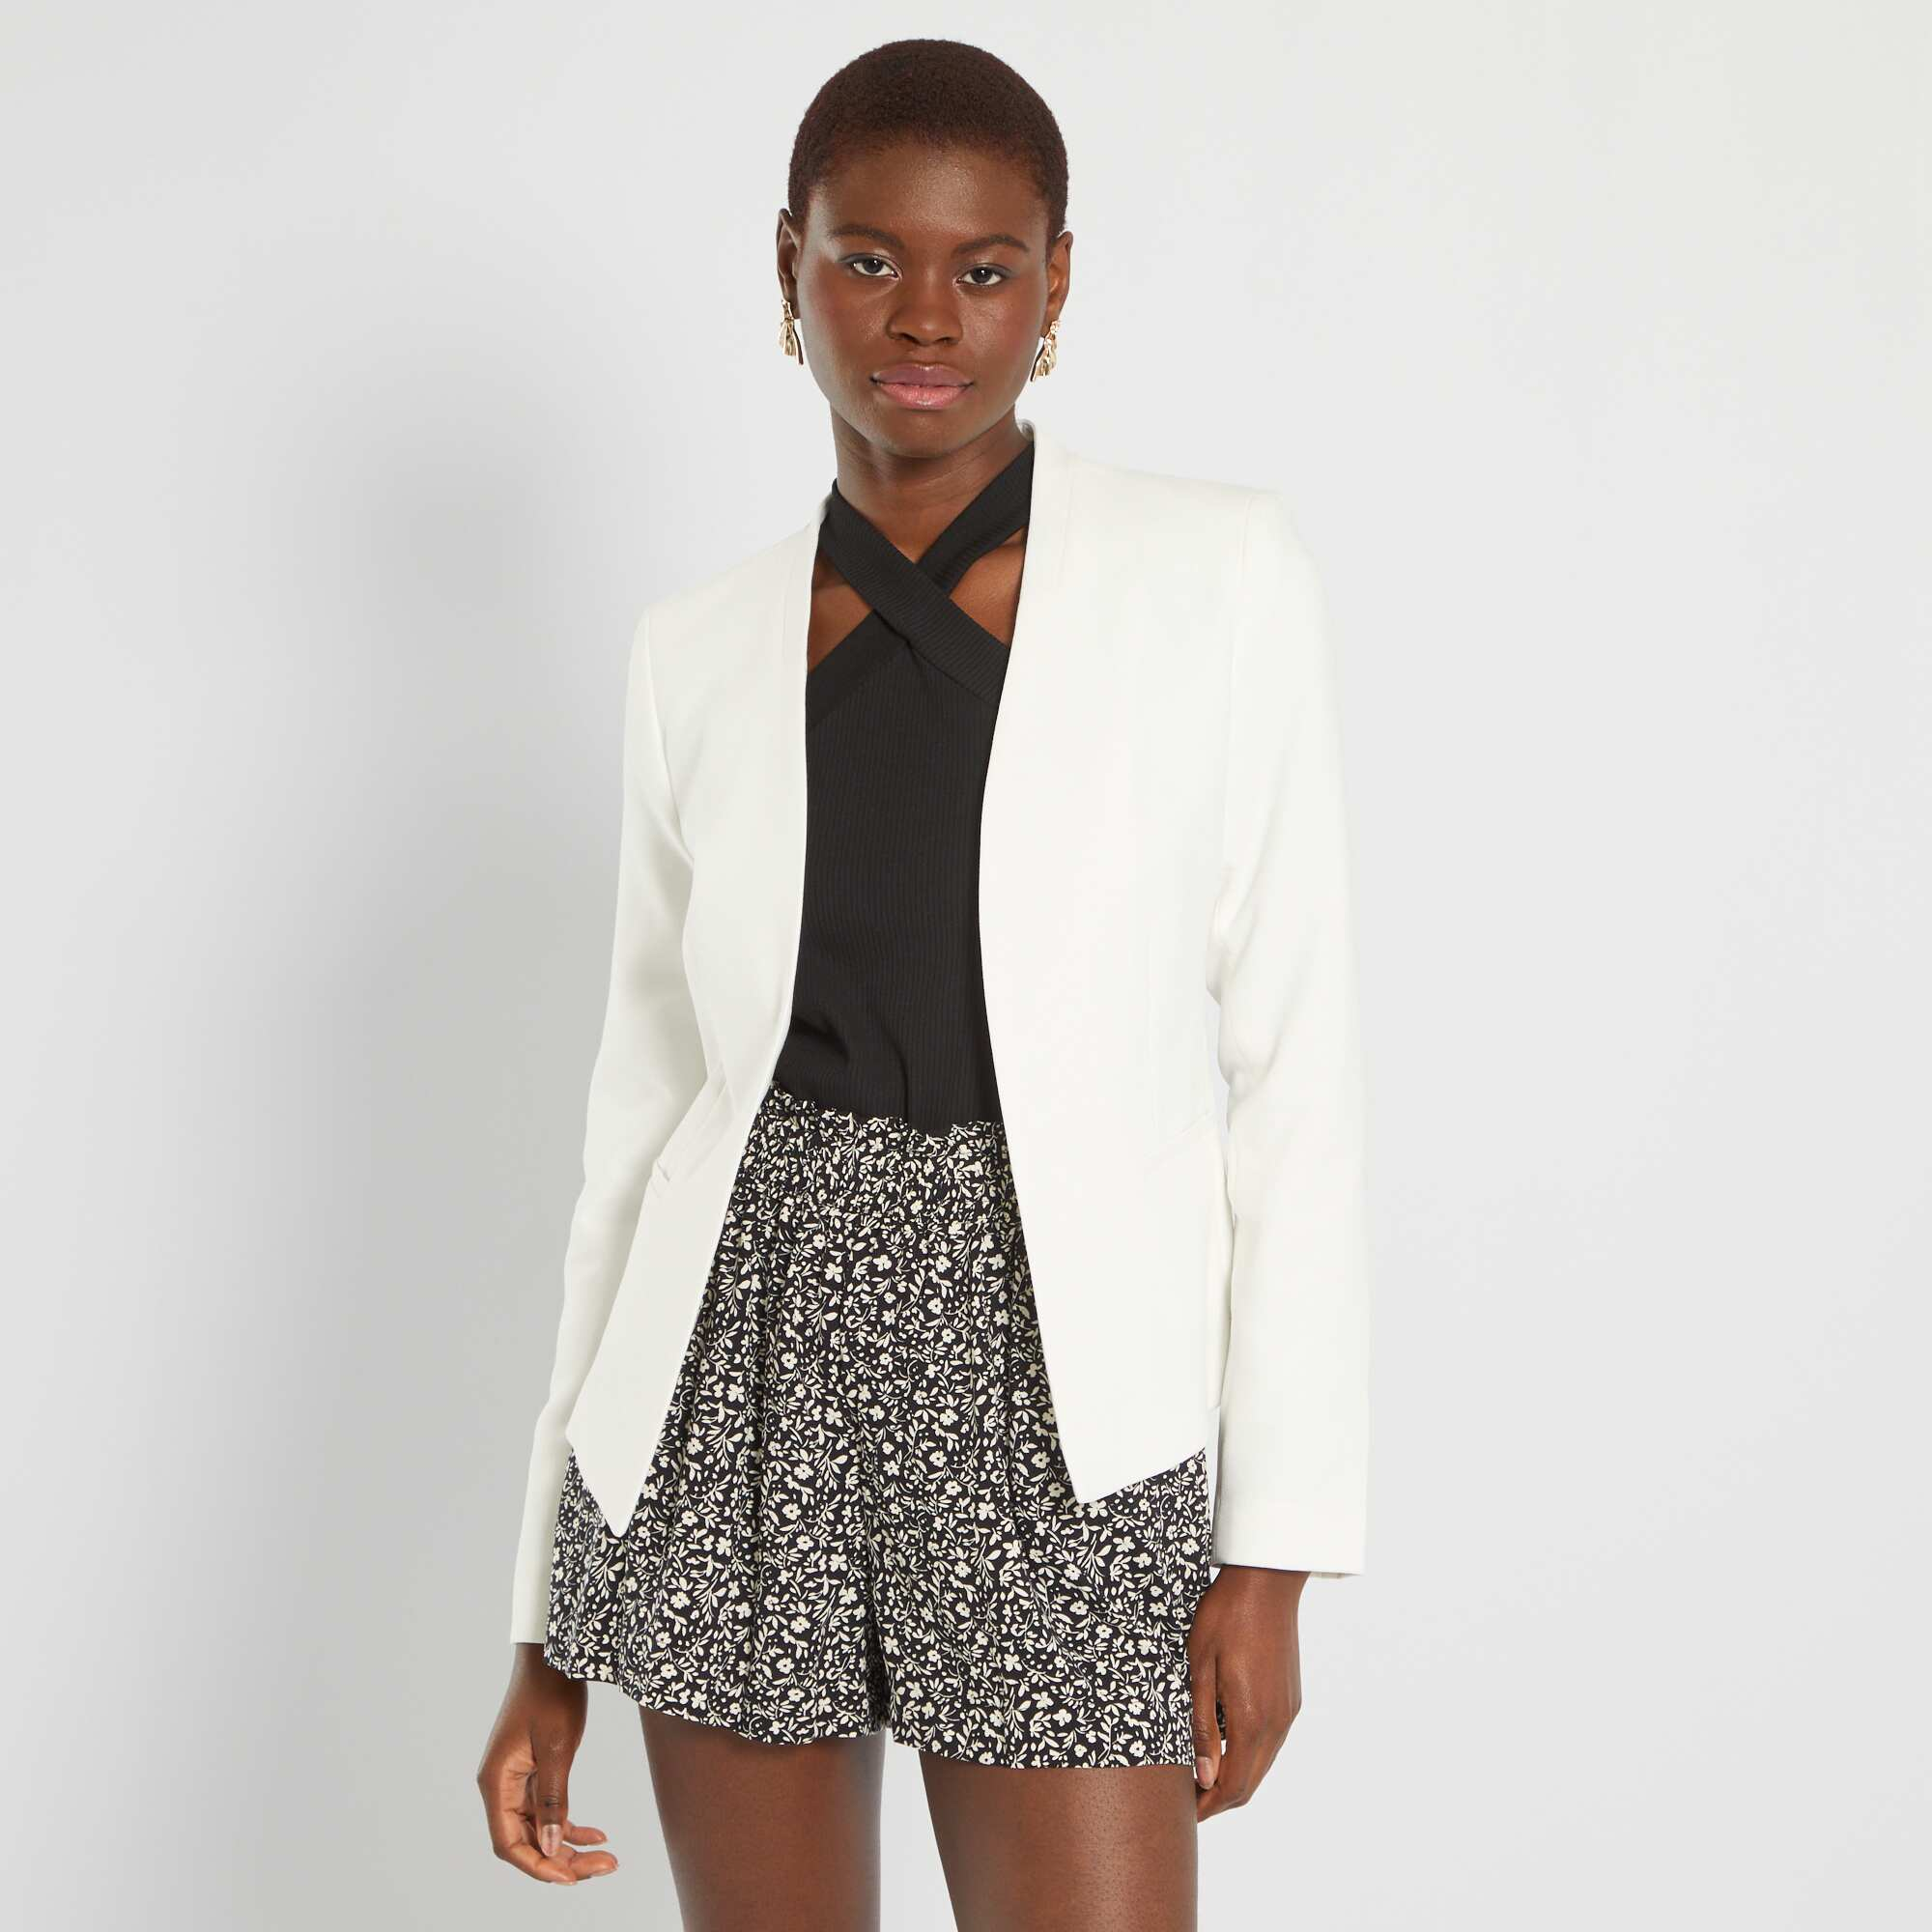 fb407341878e Veste courte de tailleur Femme - blanc - Kiabi - 25